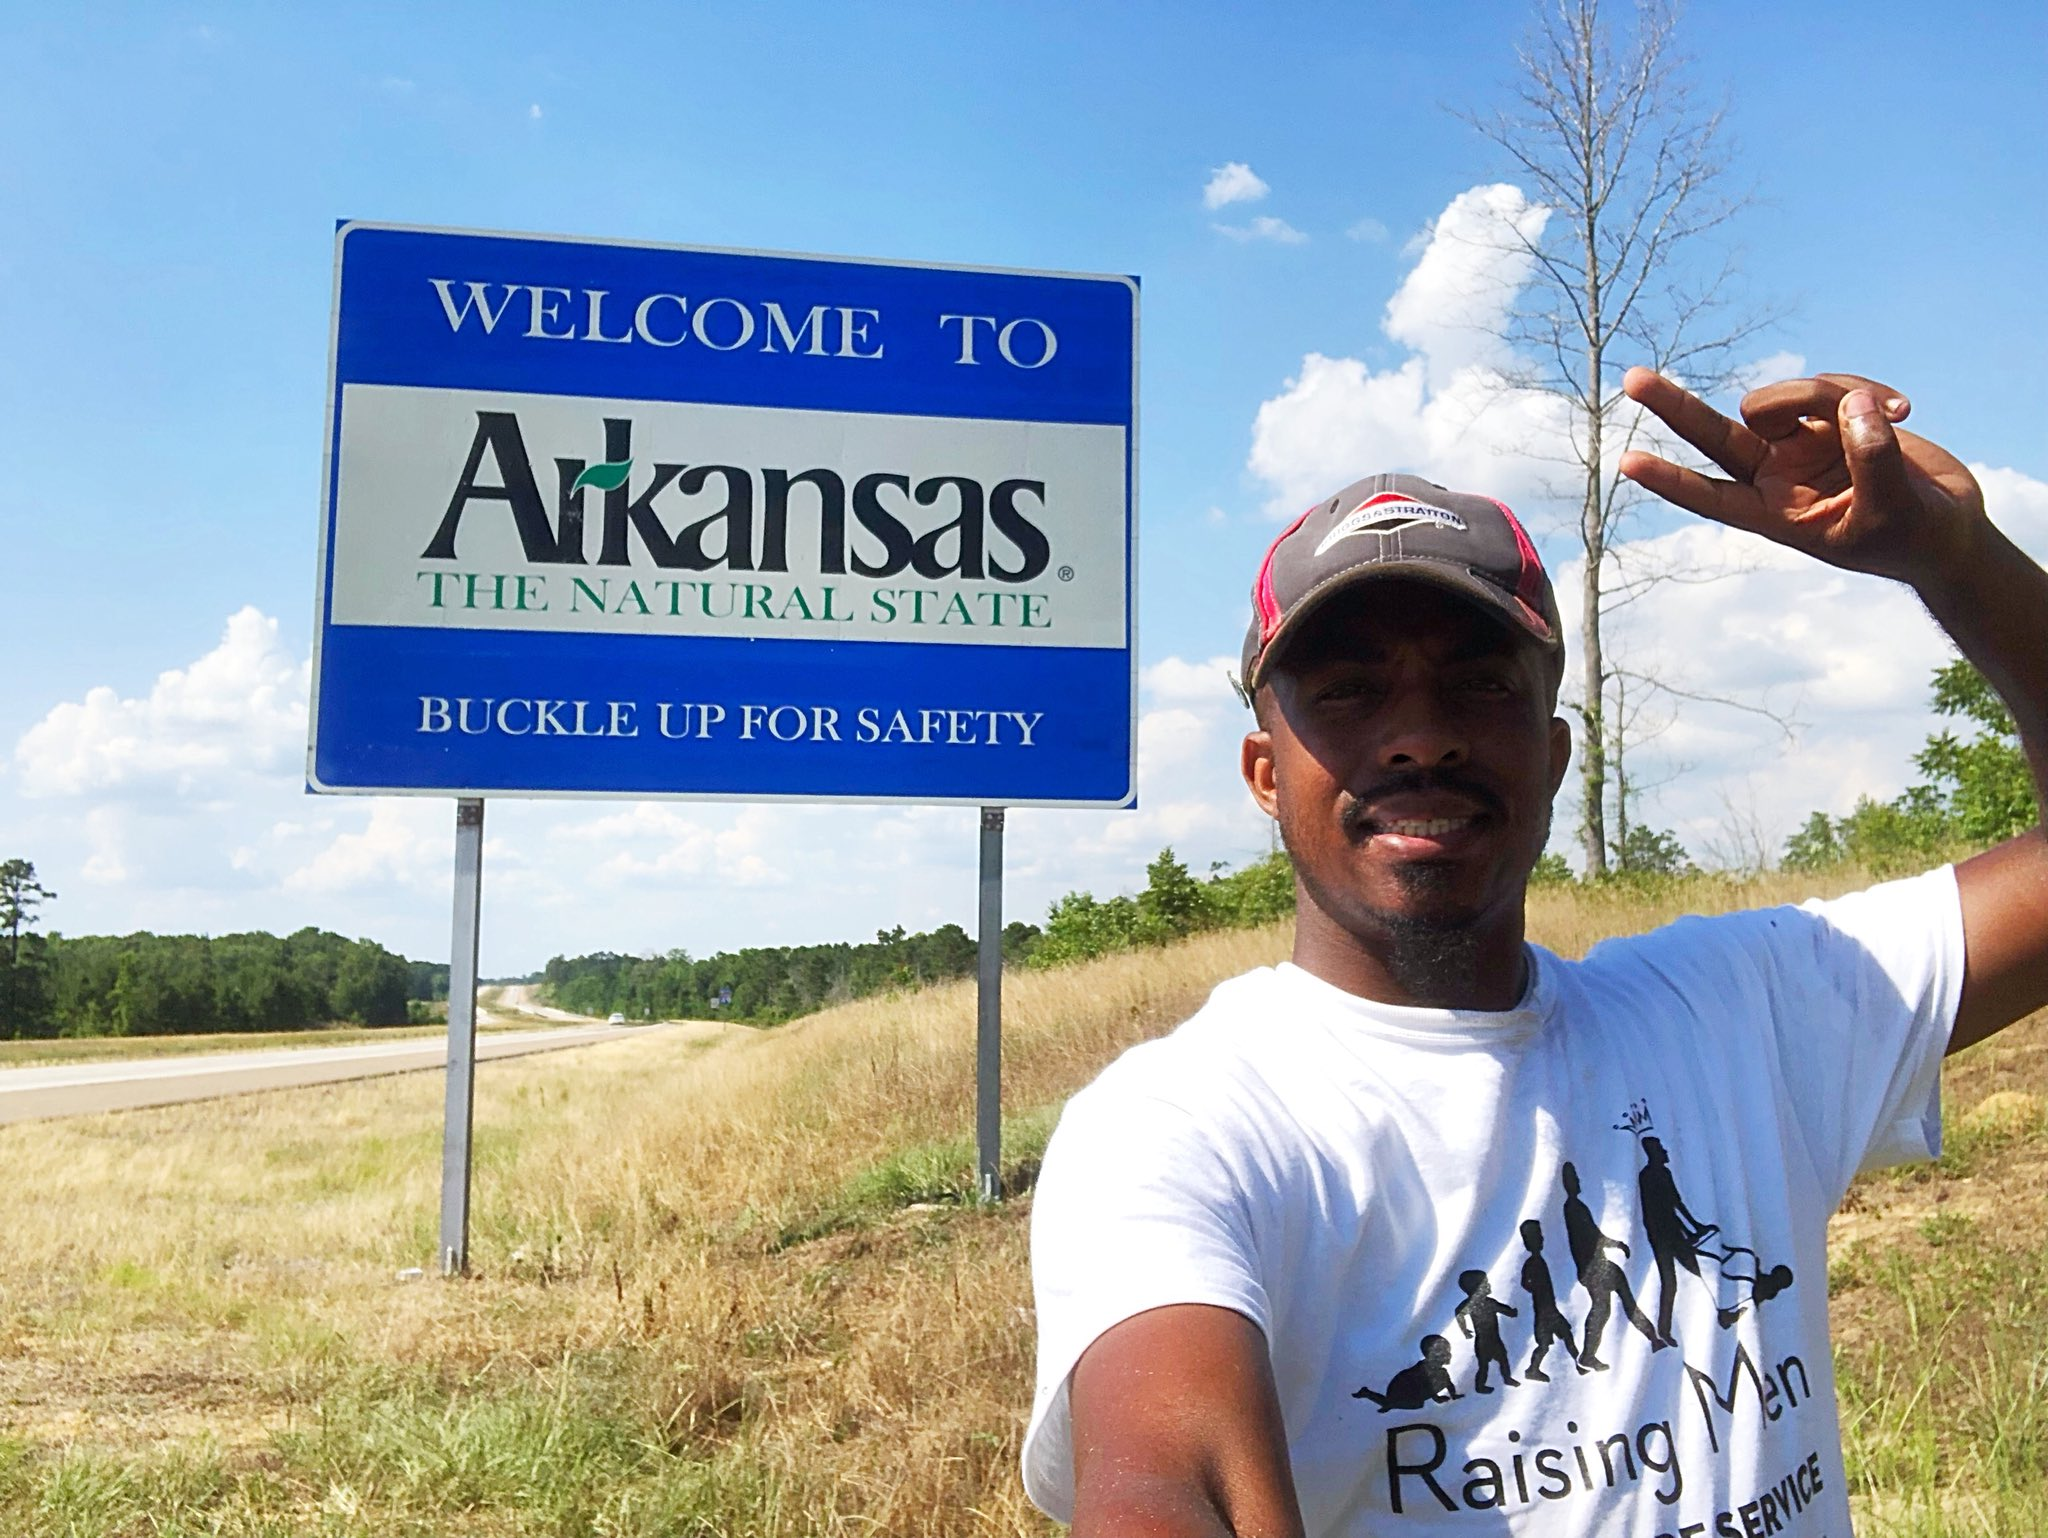 Rodney Smith Jr On Twitter Quot Hello To Arkansas I Will Be